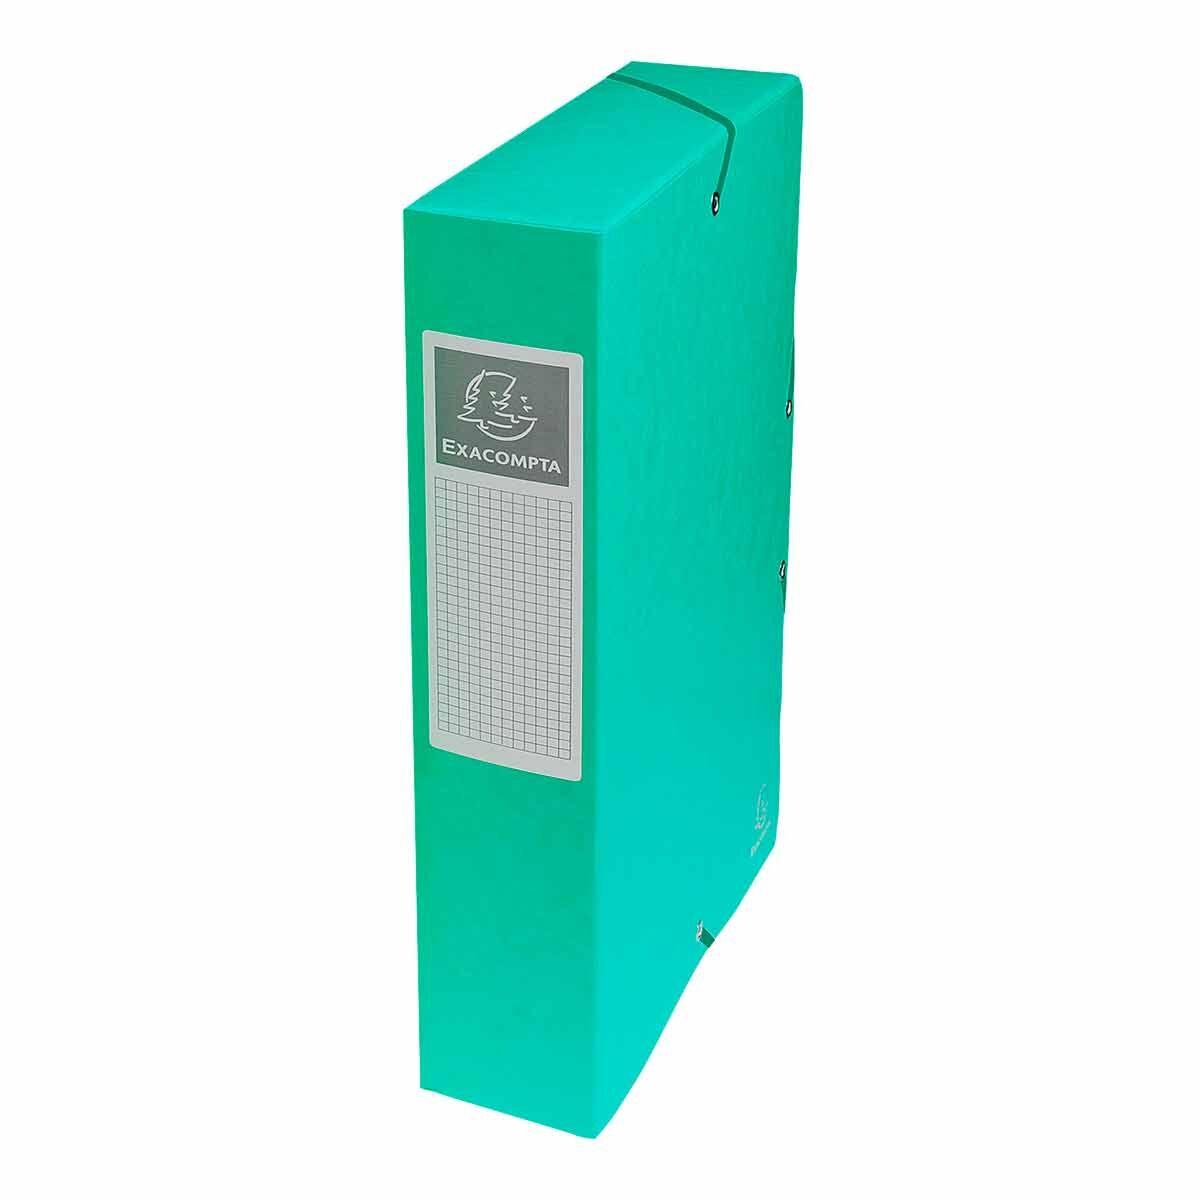 Exacompta Elasticated Box File Pressboard A4 60mm Pack of 8 Green